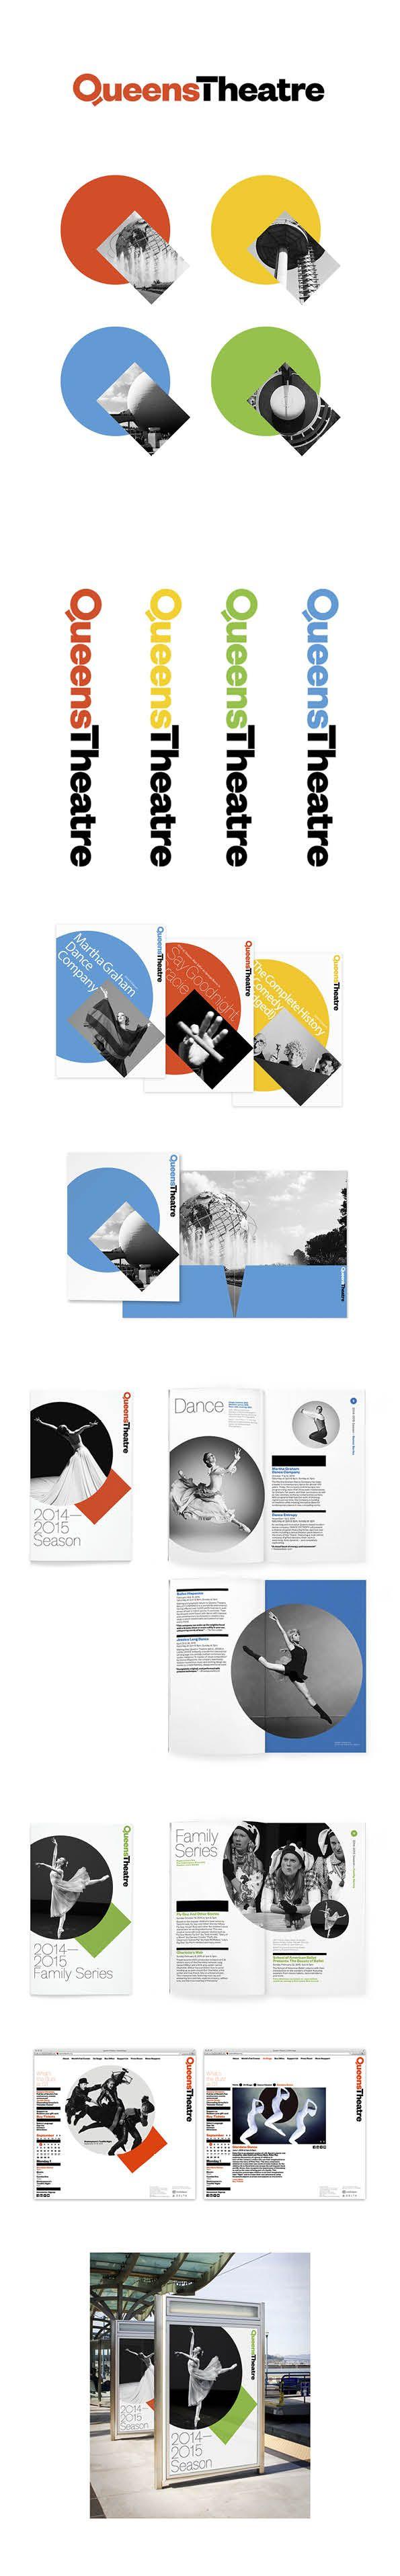 More corporate-designs are collected on: https://pinterest.com/rothenhaeusler/best-of-corporate-design/ · Client: Queens Theatre · Agency: Pentagram #branding #identity #corporatedesign